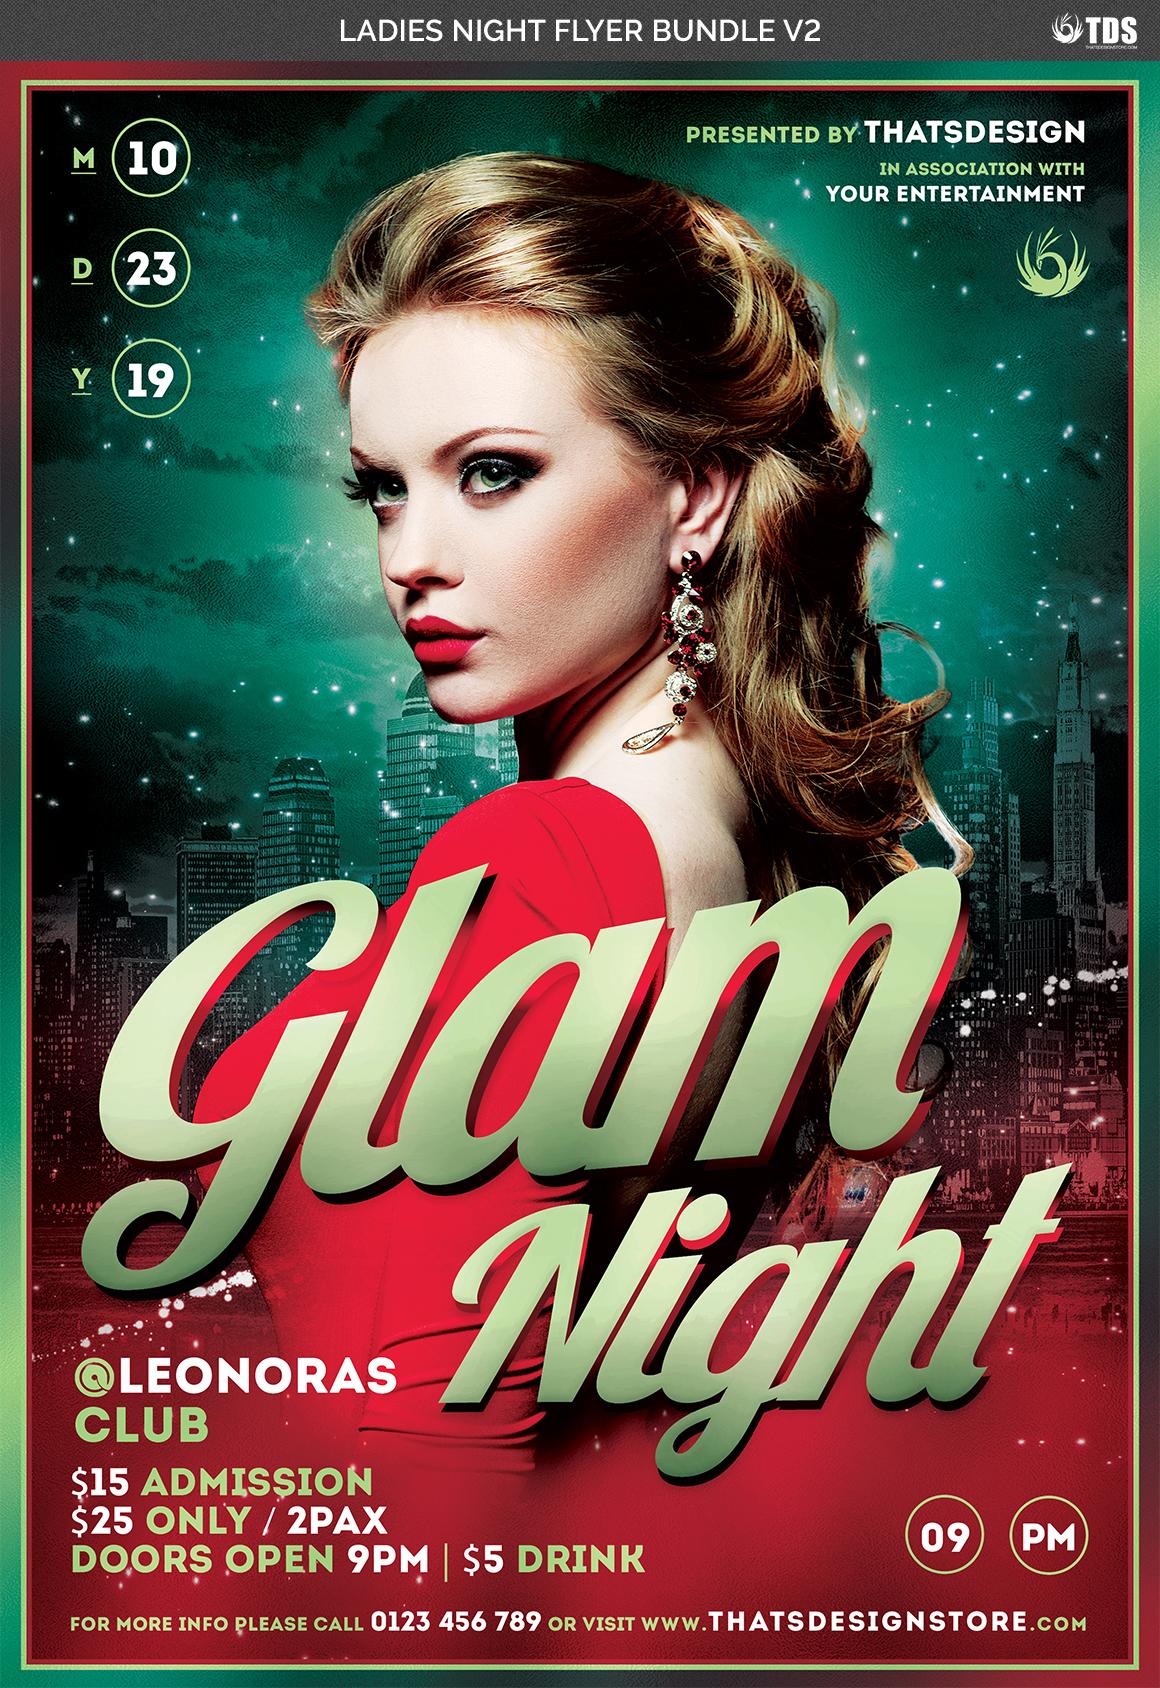 Ladies Night Flyer Bundle V2 example image 7